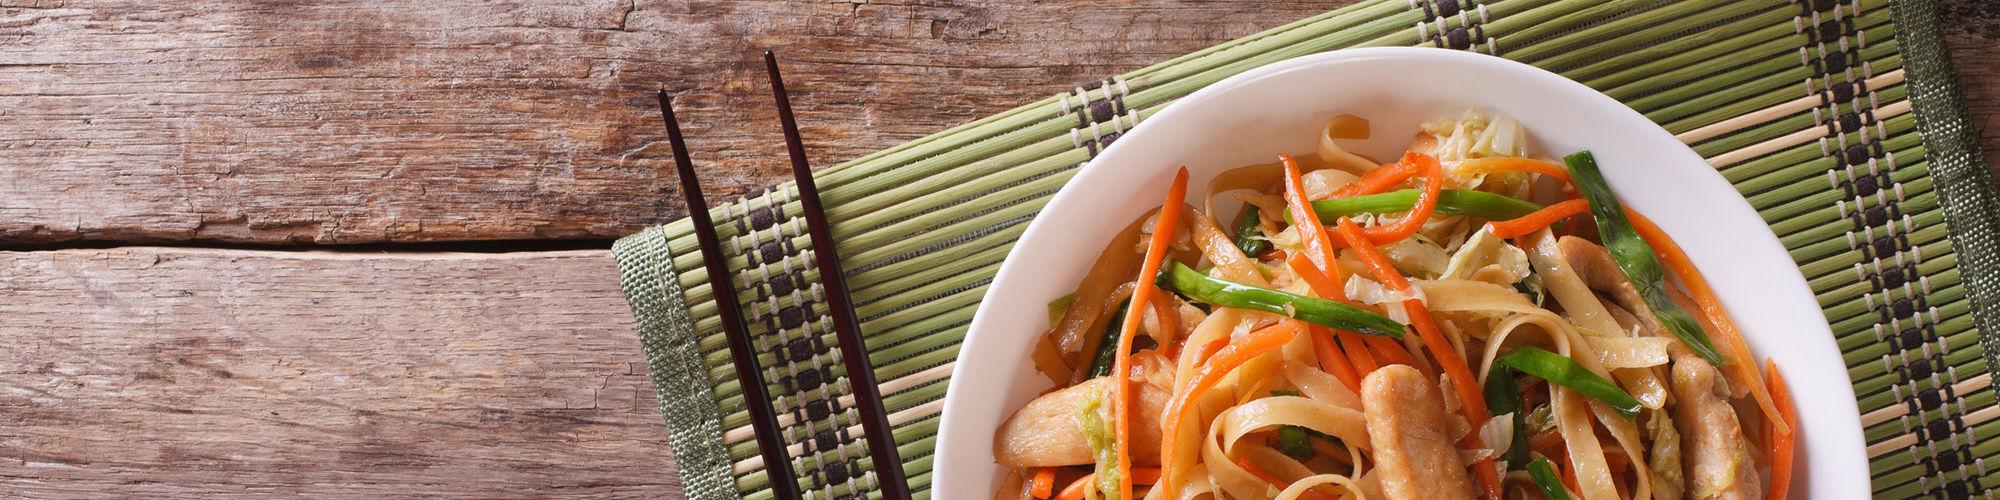 Chinese Restaurant Dundee | Chinese Takeaway Dundee | Mandarin Garden